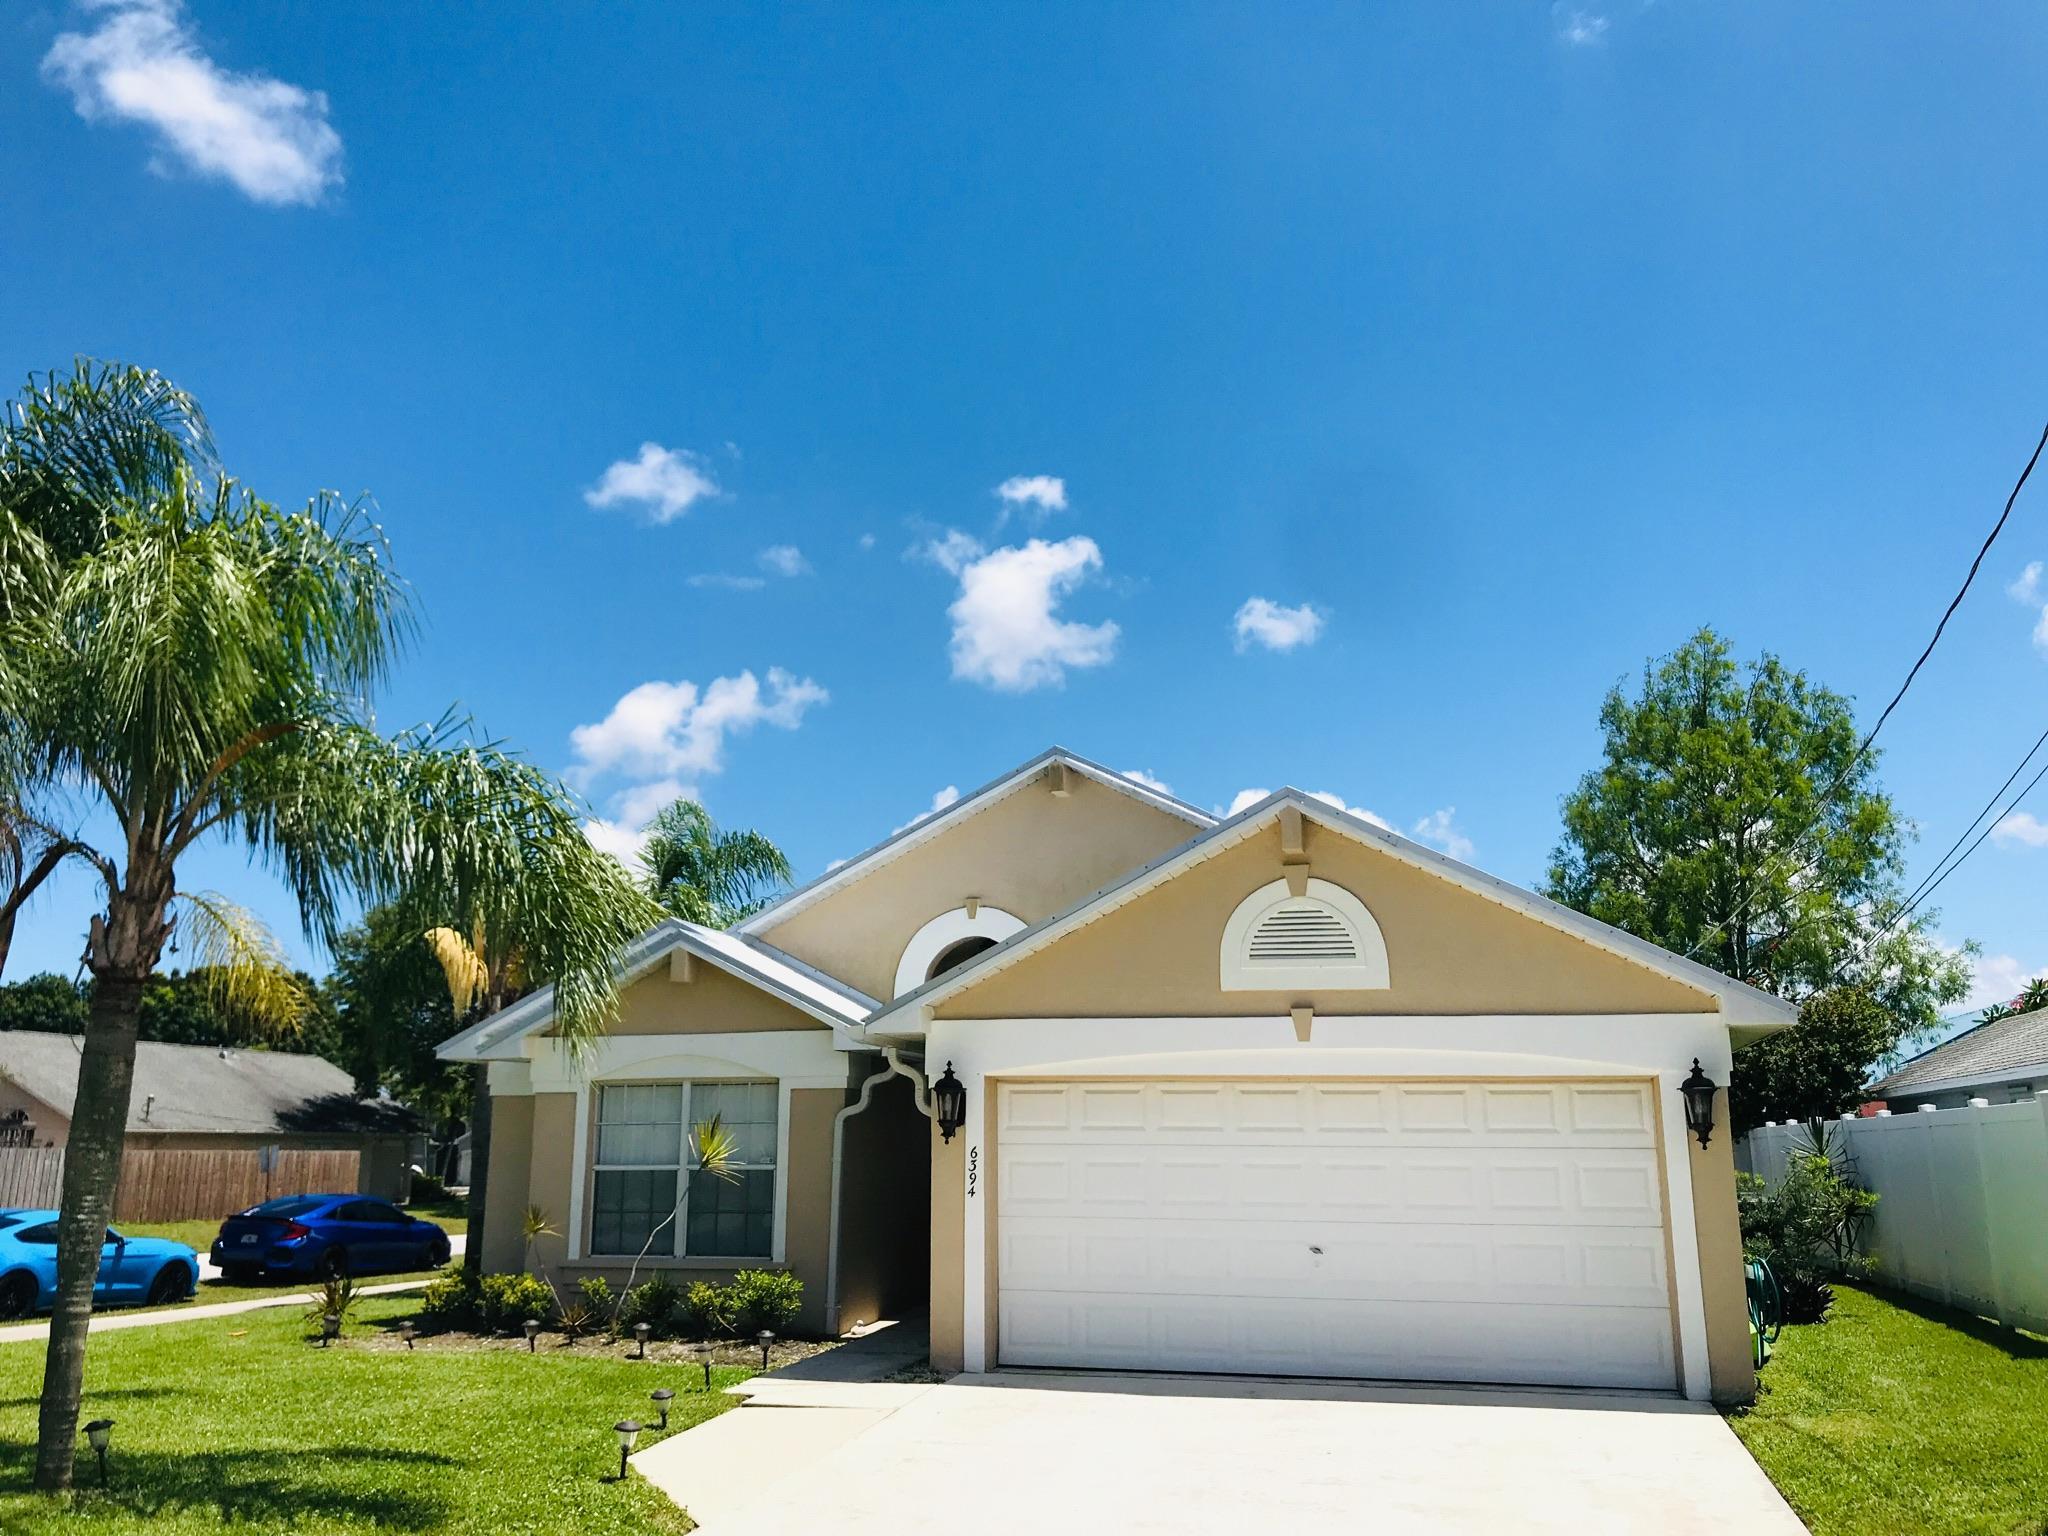 Photo of 6394 Lauderdale Street, Jupiter, FL 33458